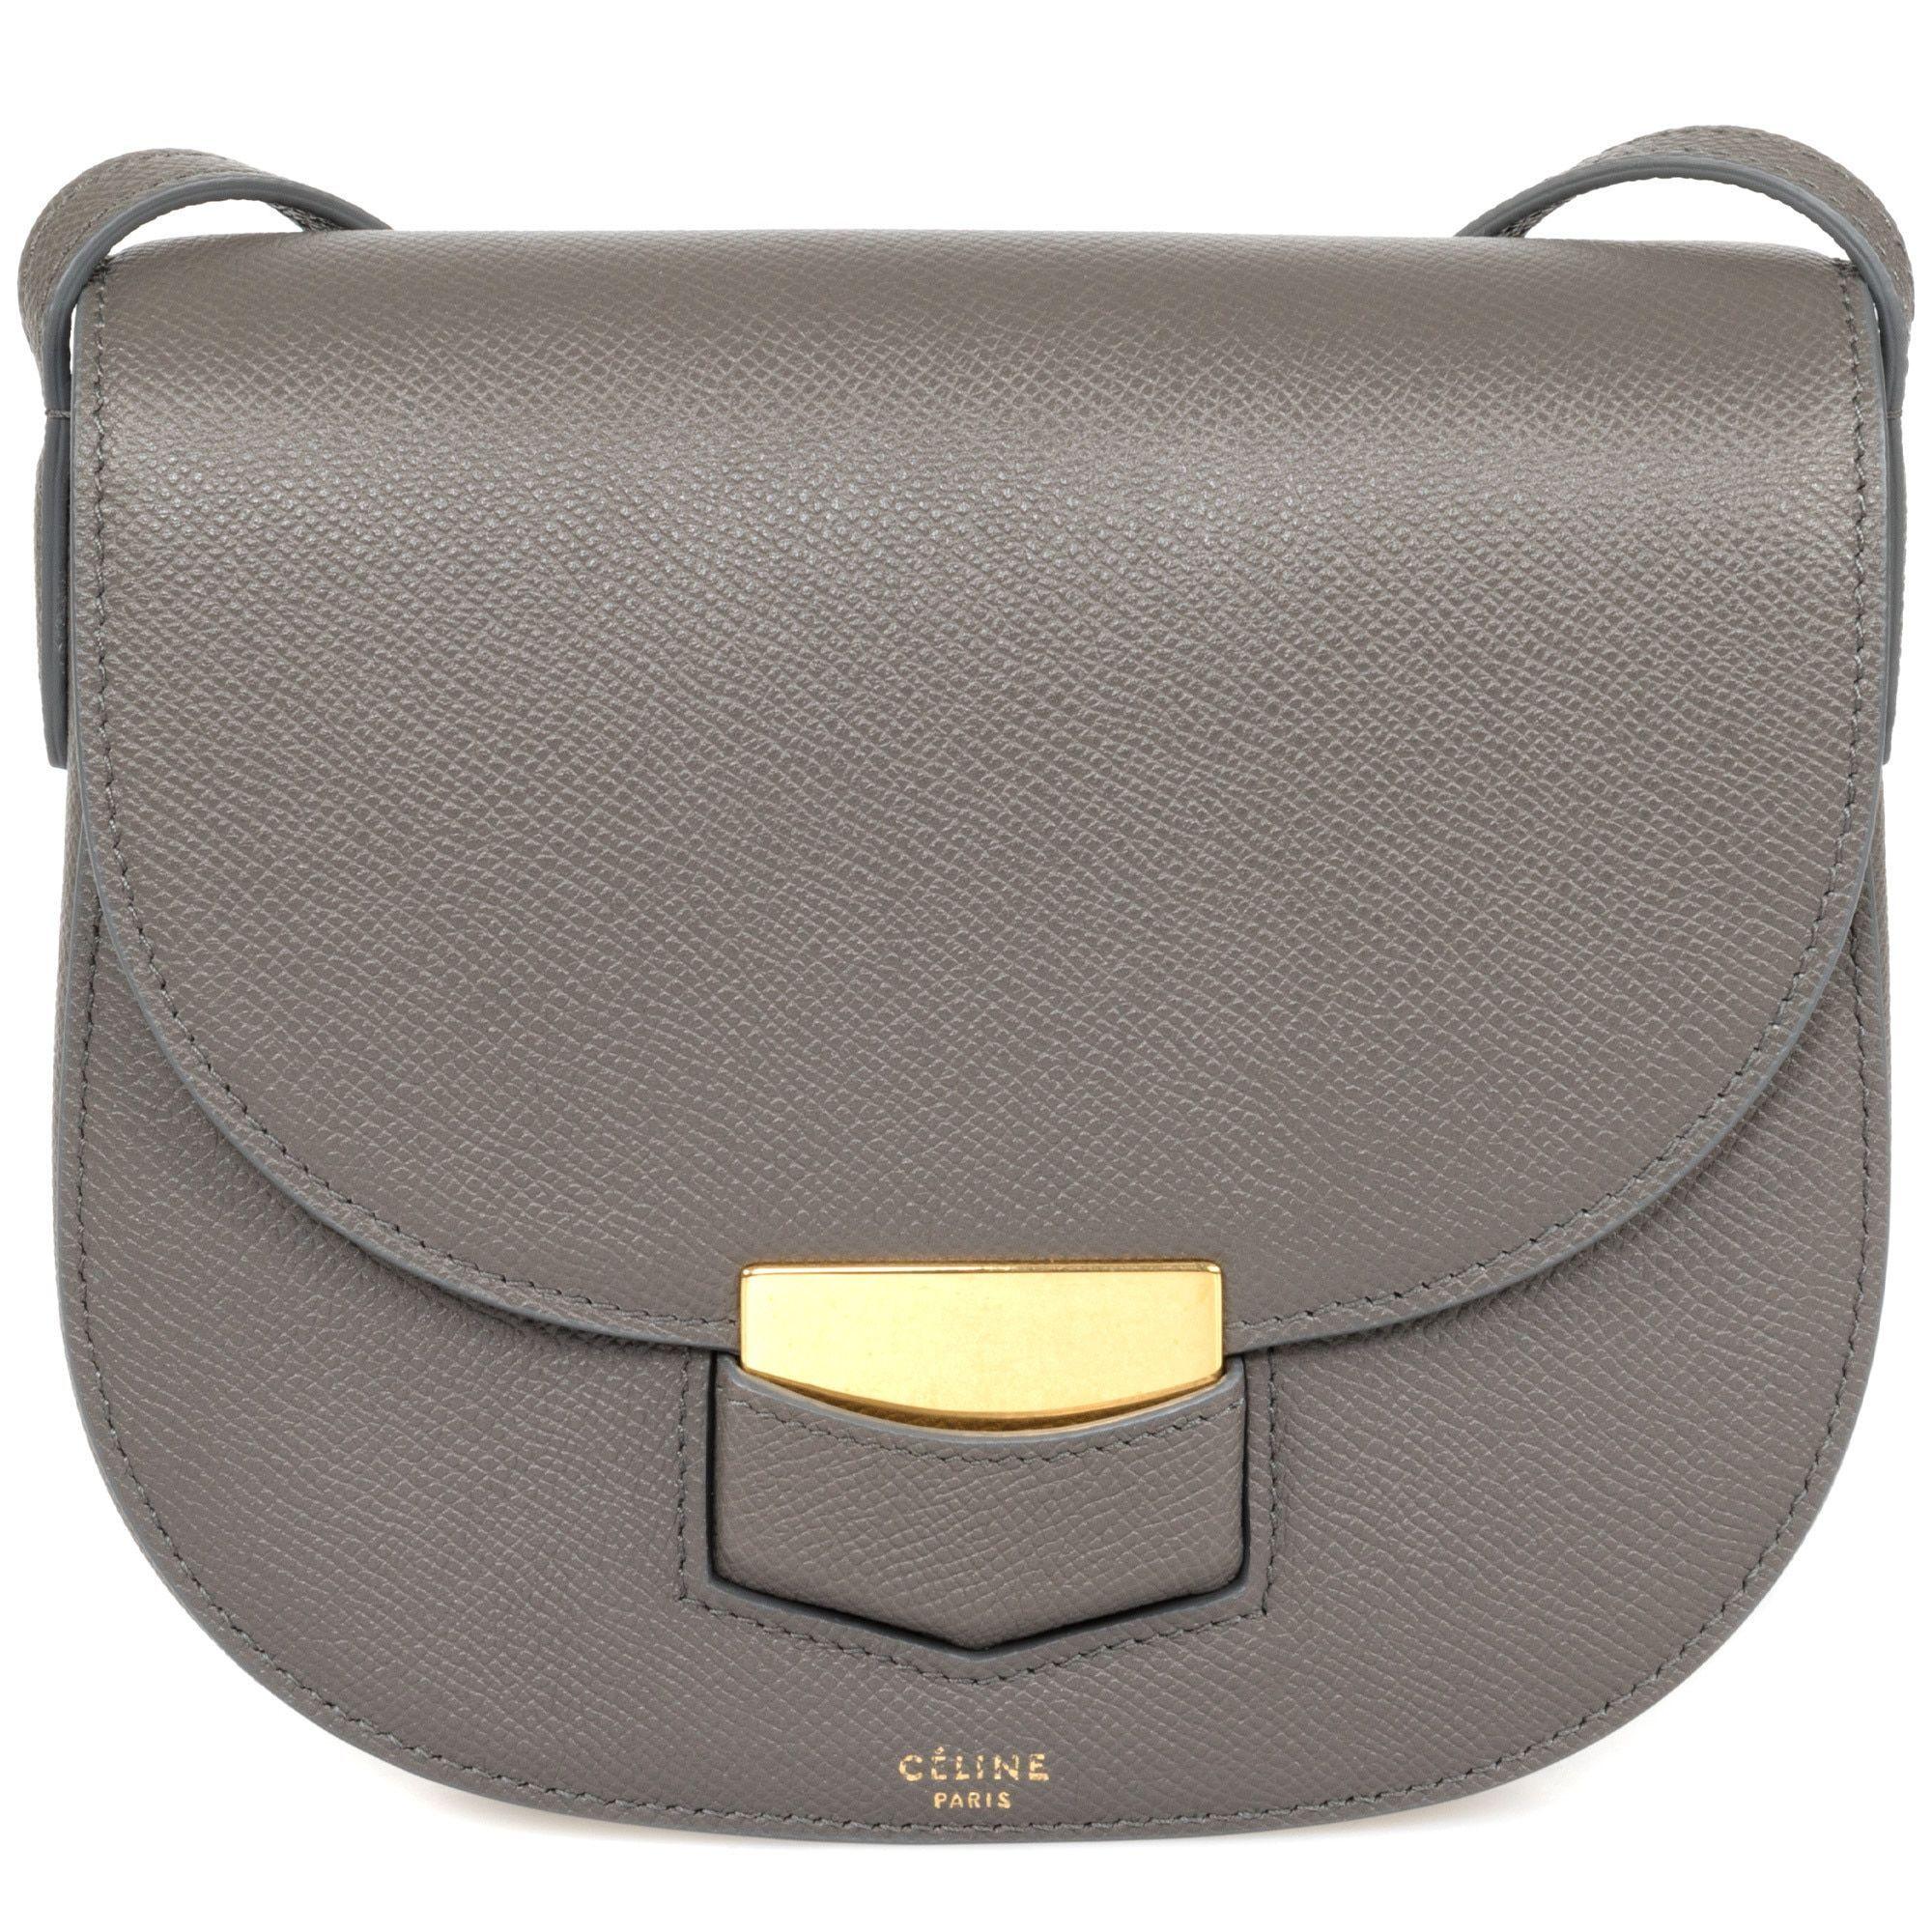 3df2f3b6a5bf Celine Trotteur Gray Grained Calfskin Crossbody Handbag